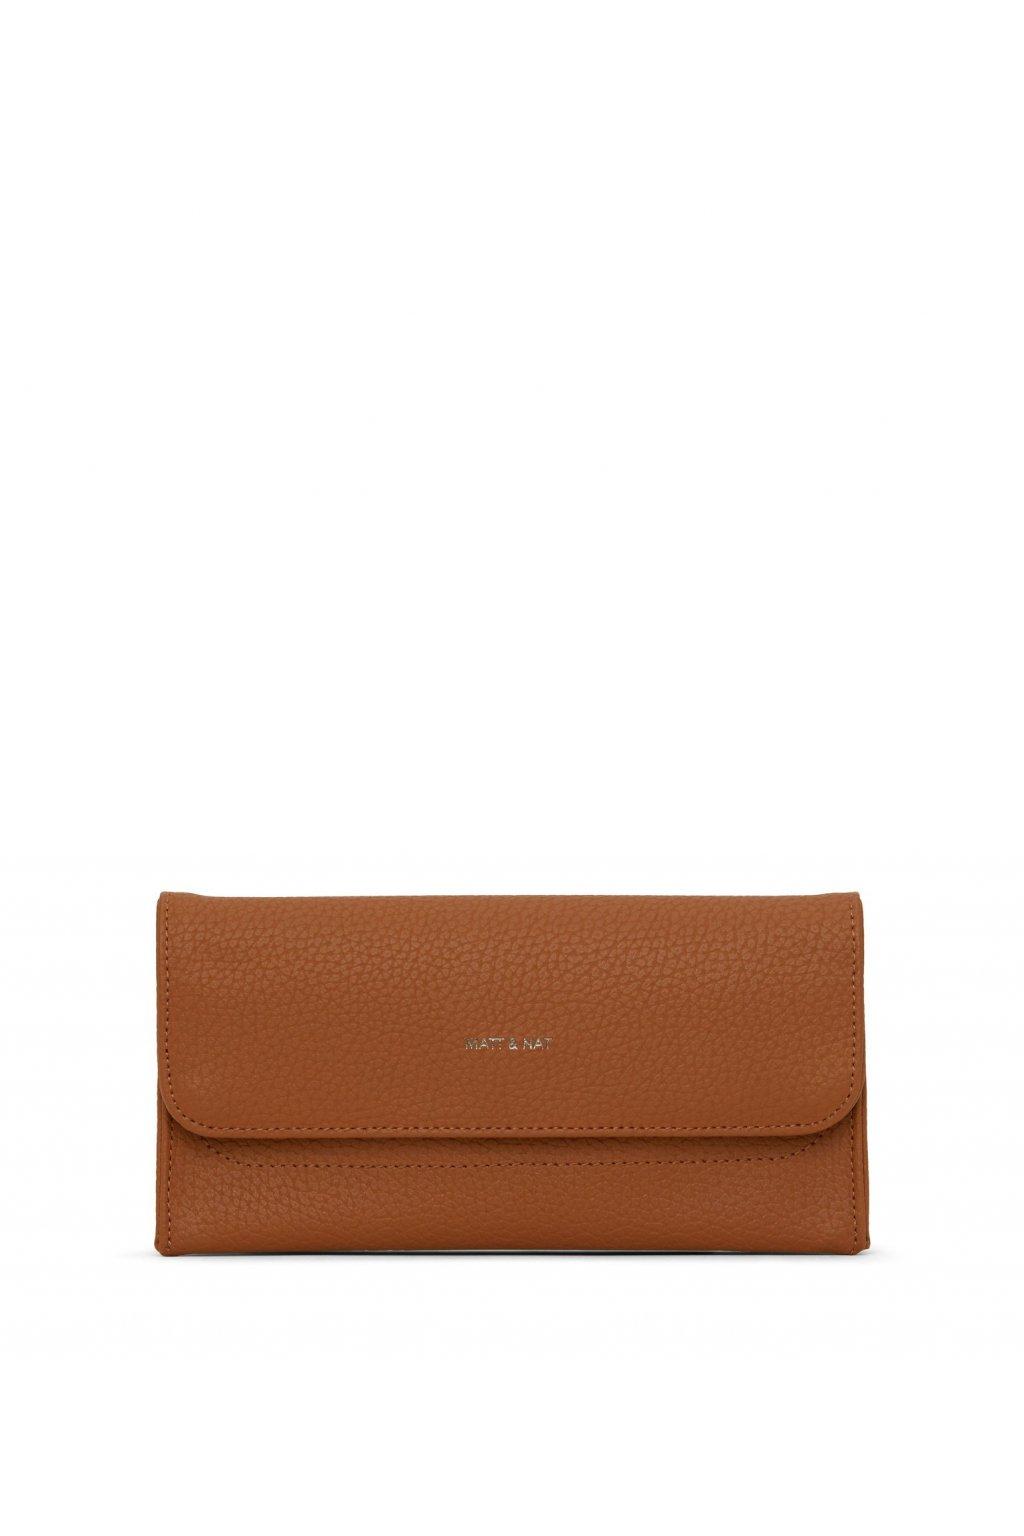 "Dámska oranžová peňaženka ""NIKI carotene"" - kolekcia Purity"